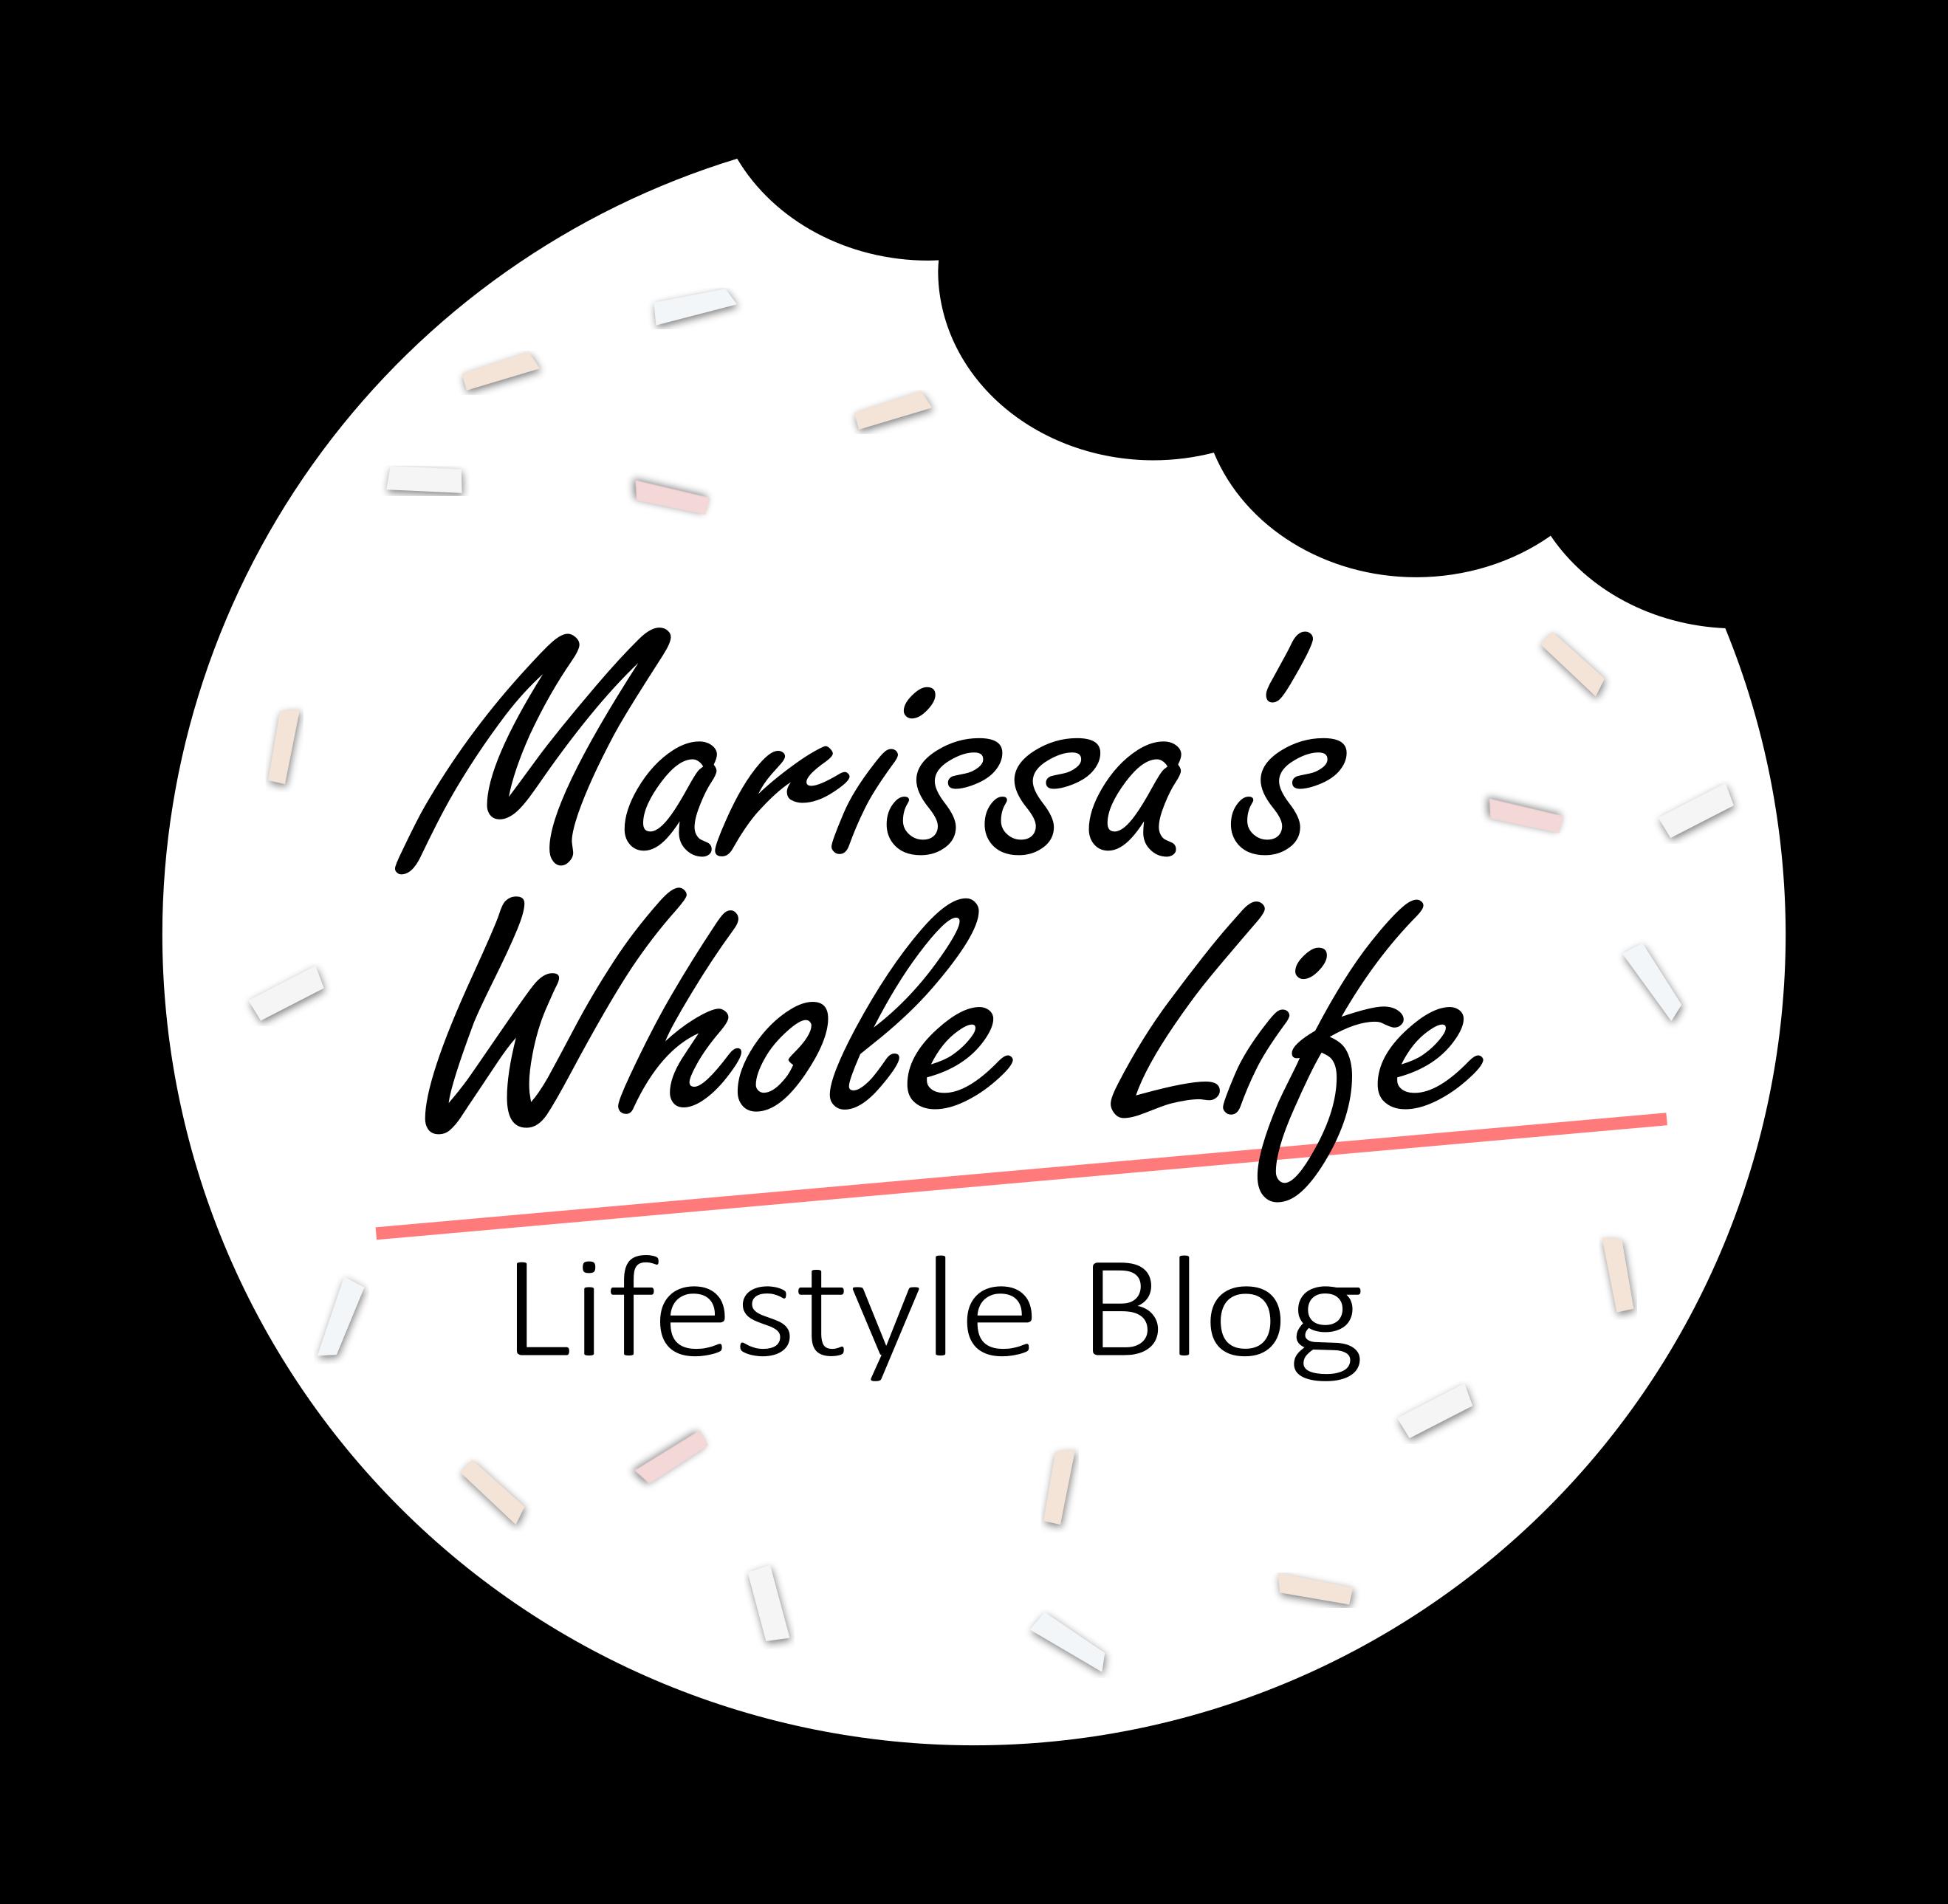 Marissas Whole Life